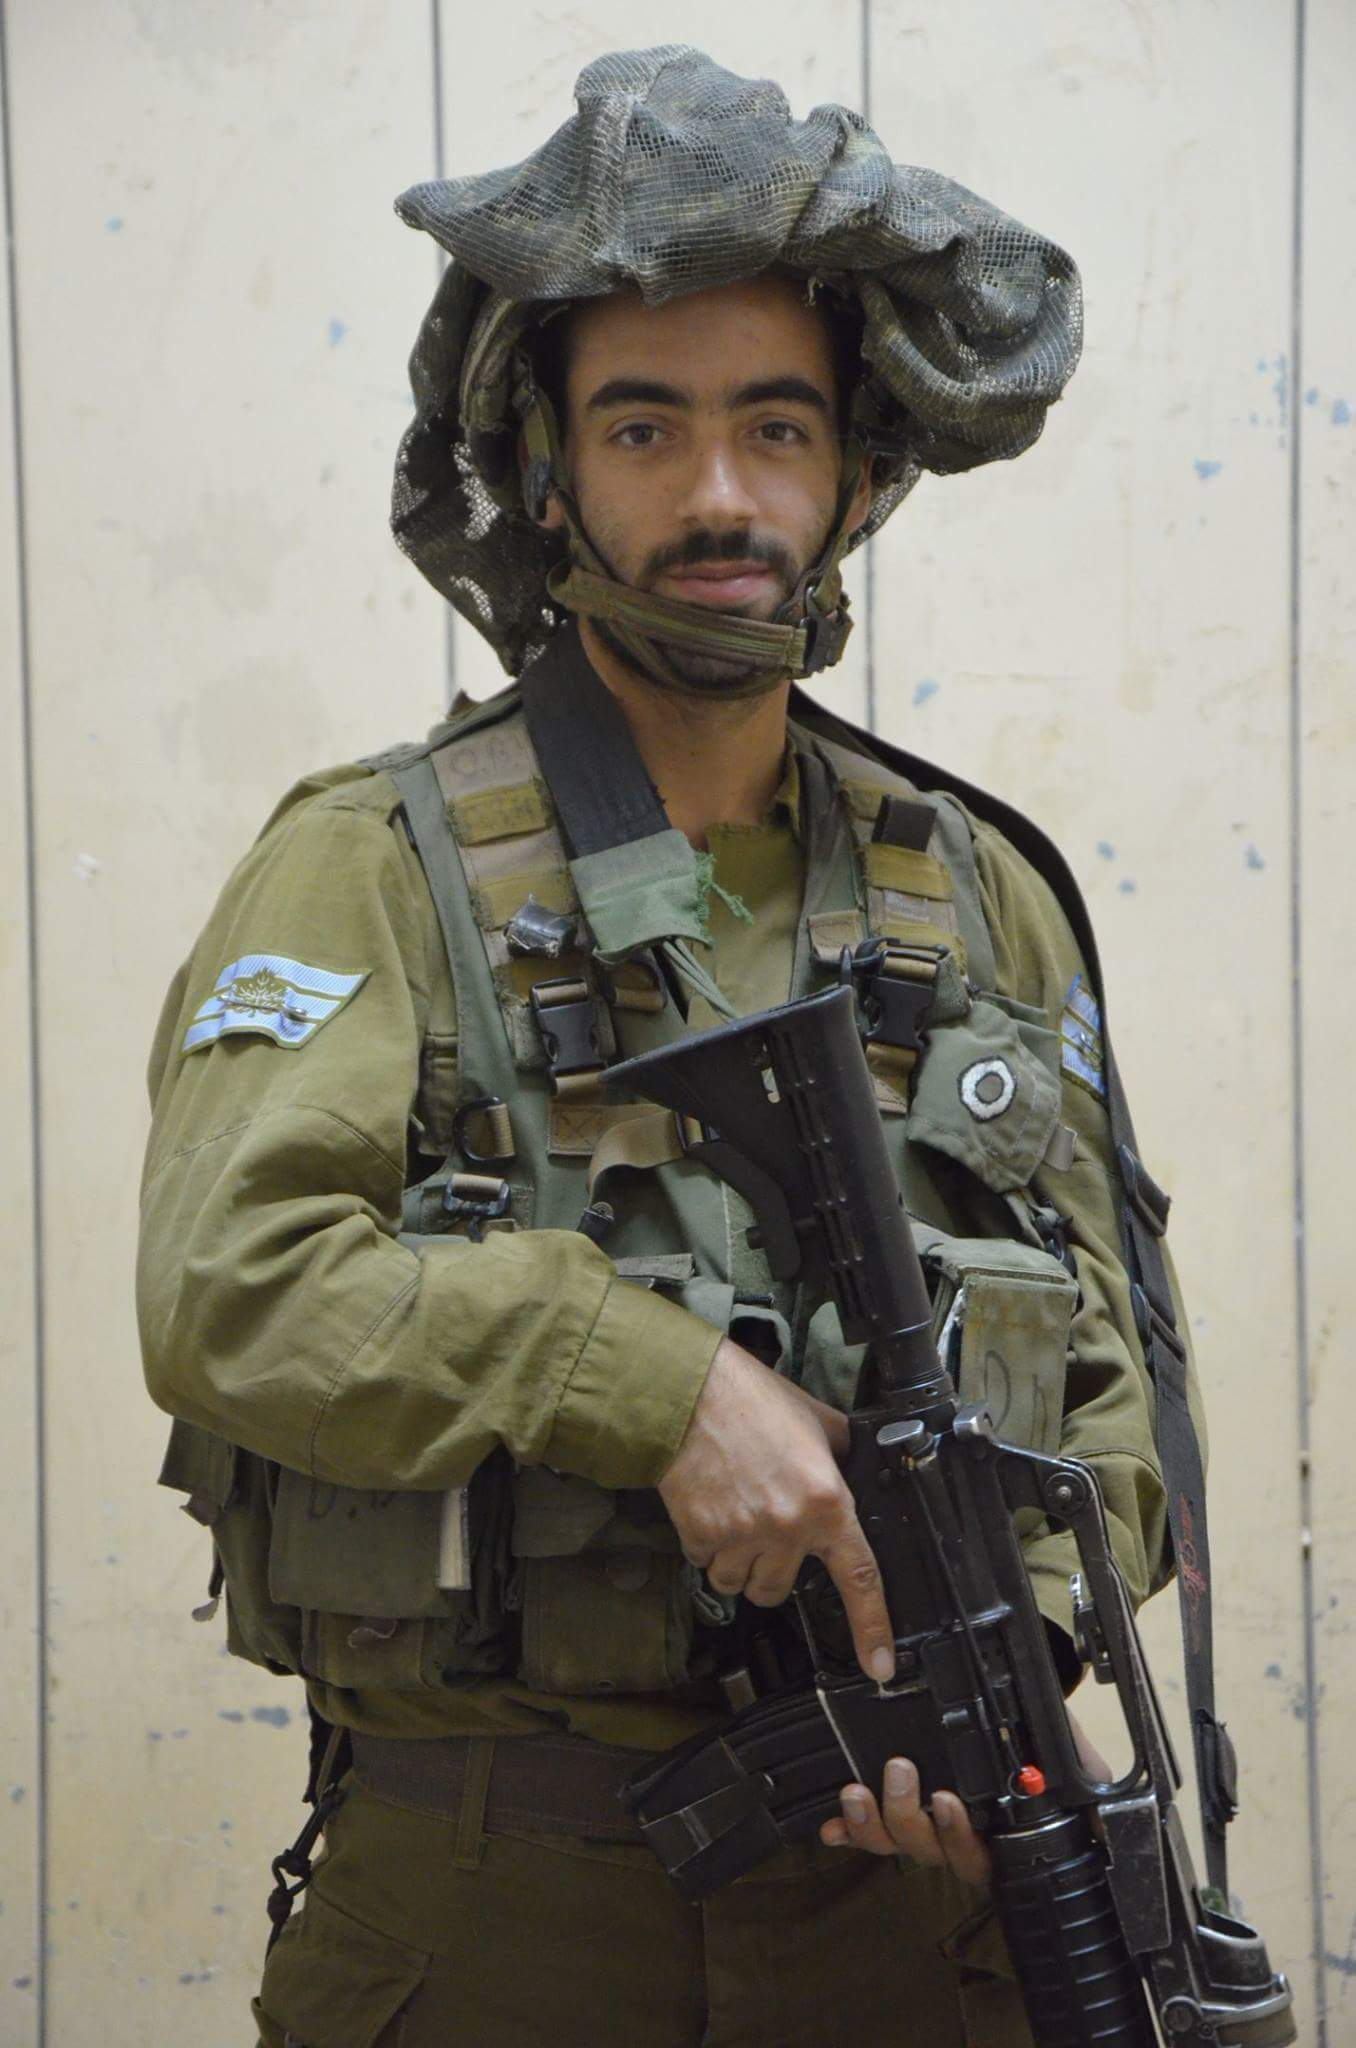 Why do Israeli soldiers wear strange hats? - Quora